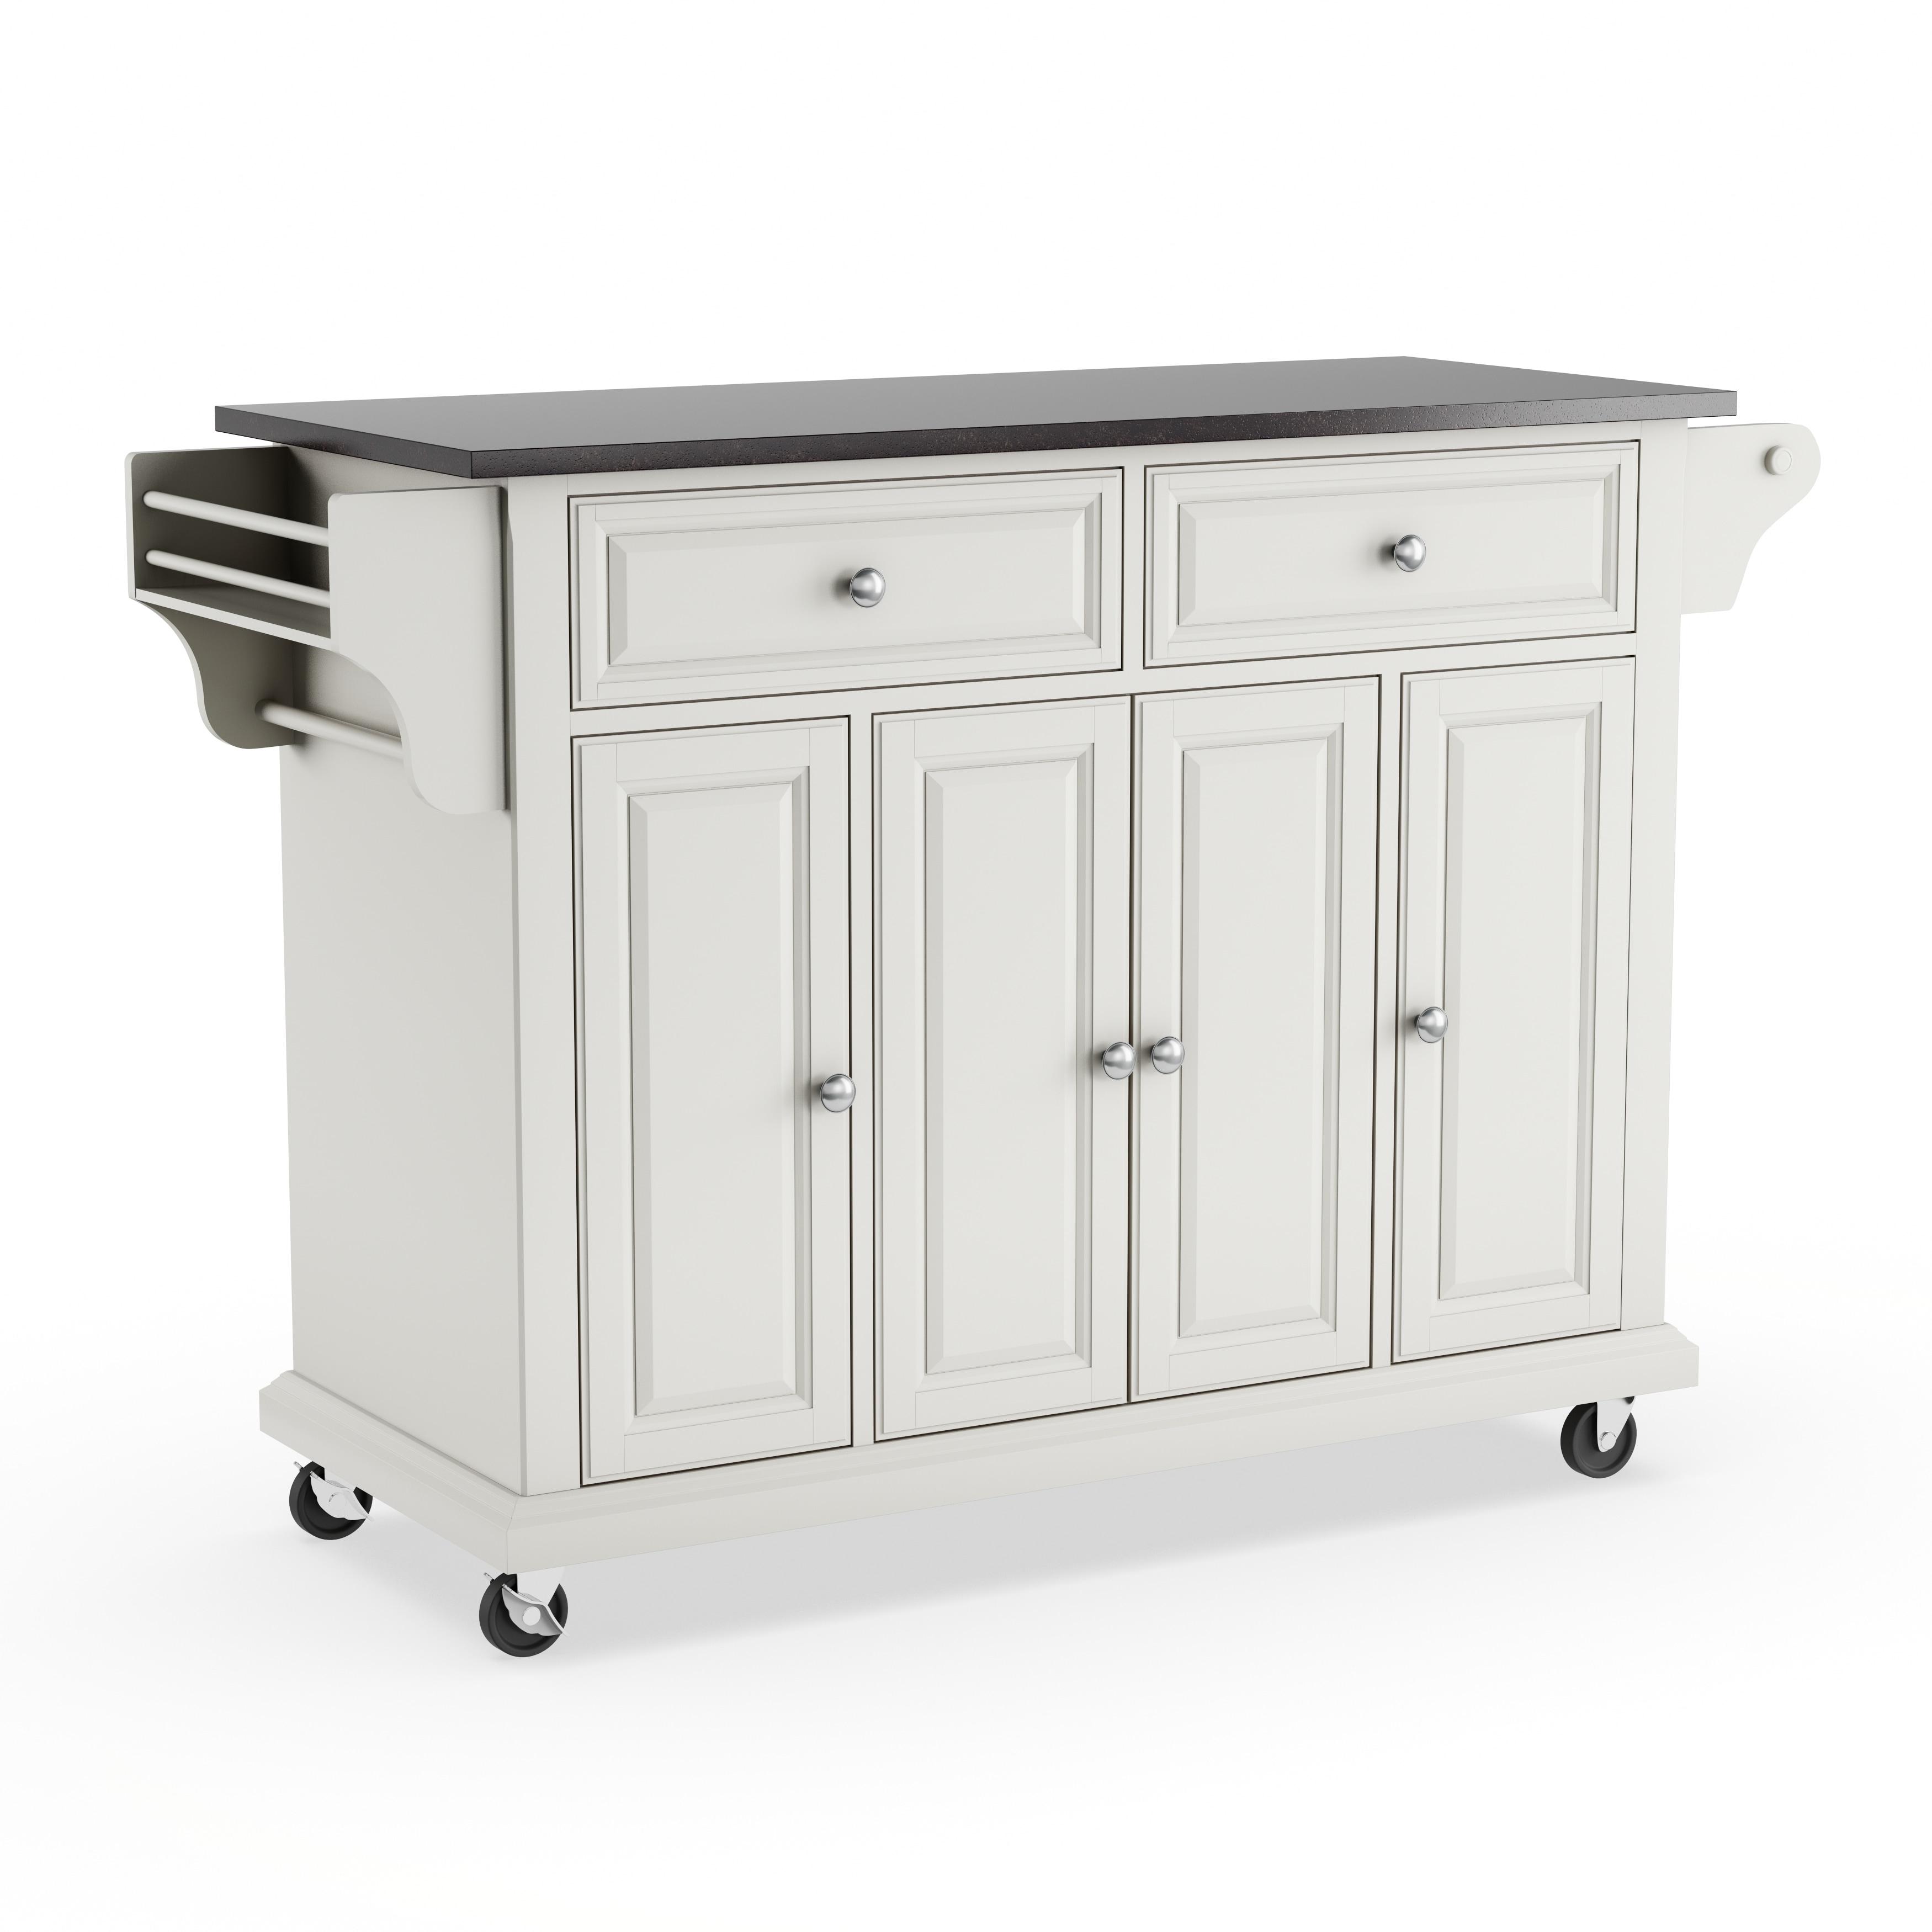 Shop Copper Grove Tillebrook Solid Black Granite Top Kitchen Cart